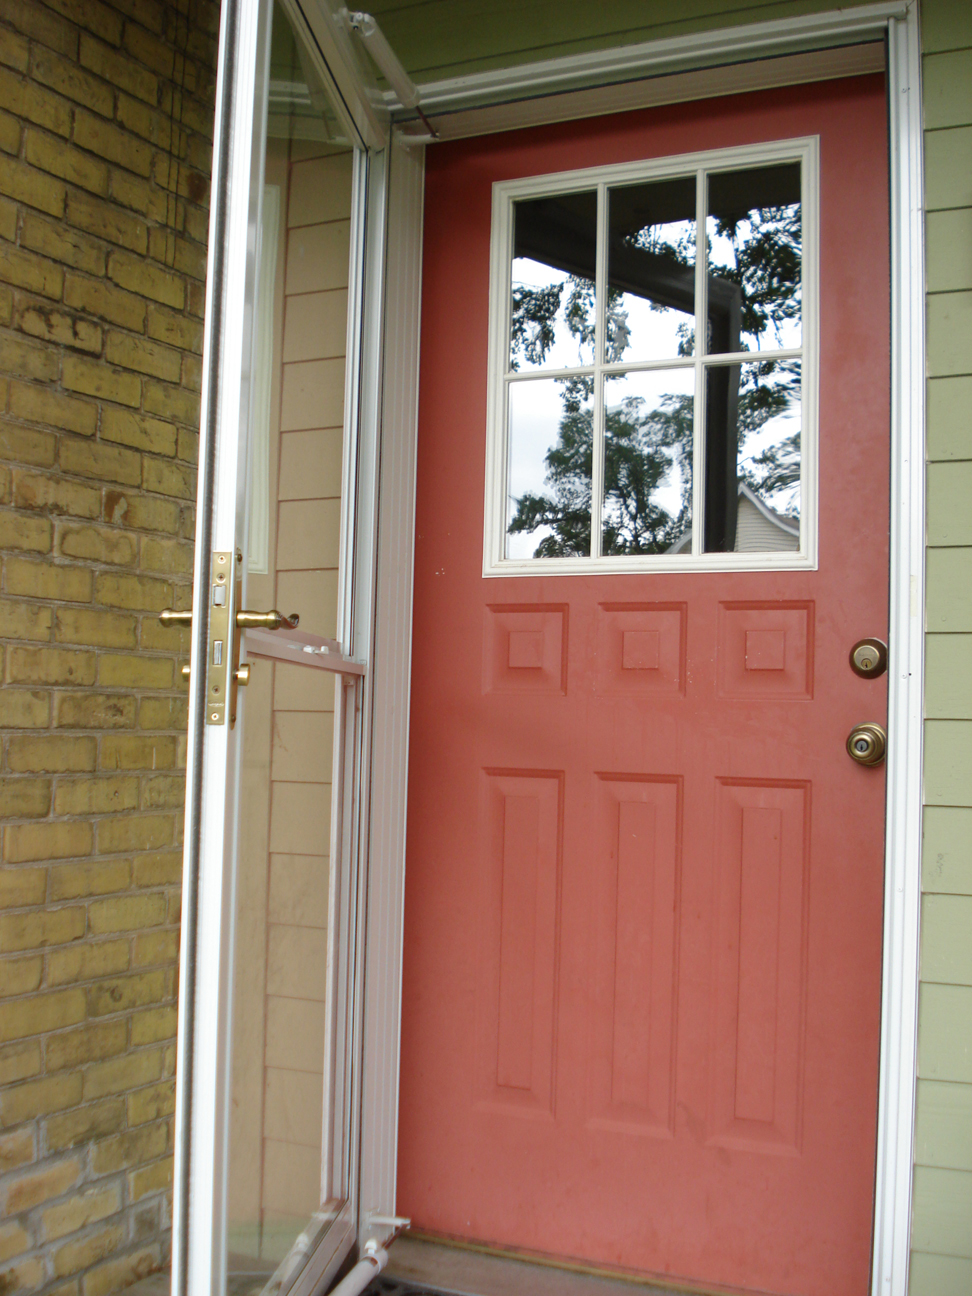 Repainting The Front Door The Woo Woo Teacup Journal